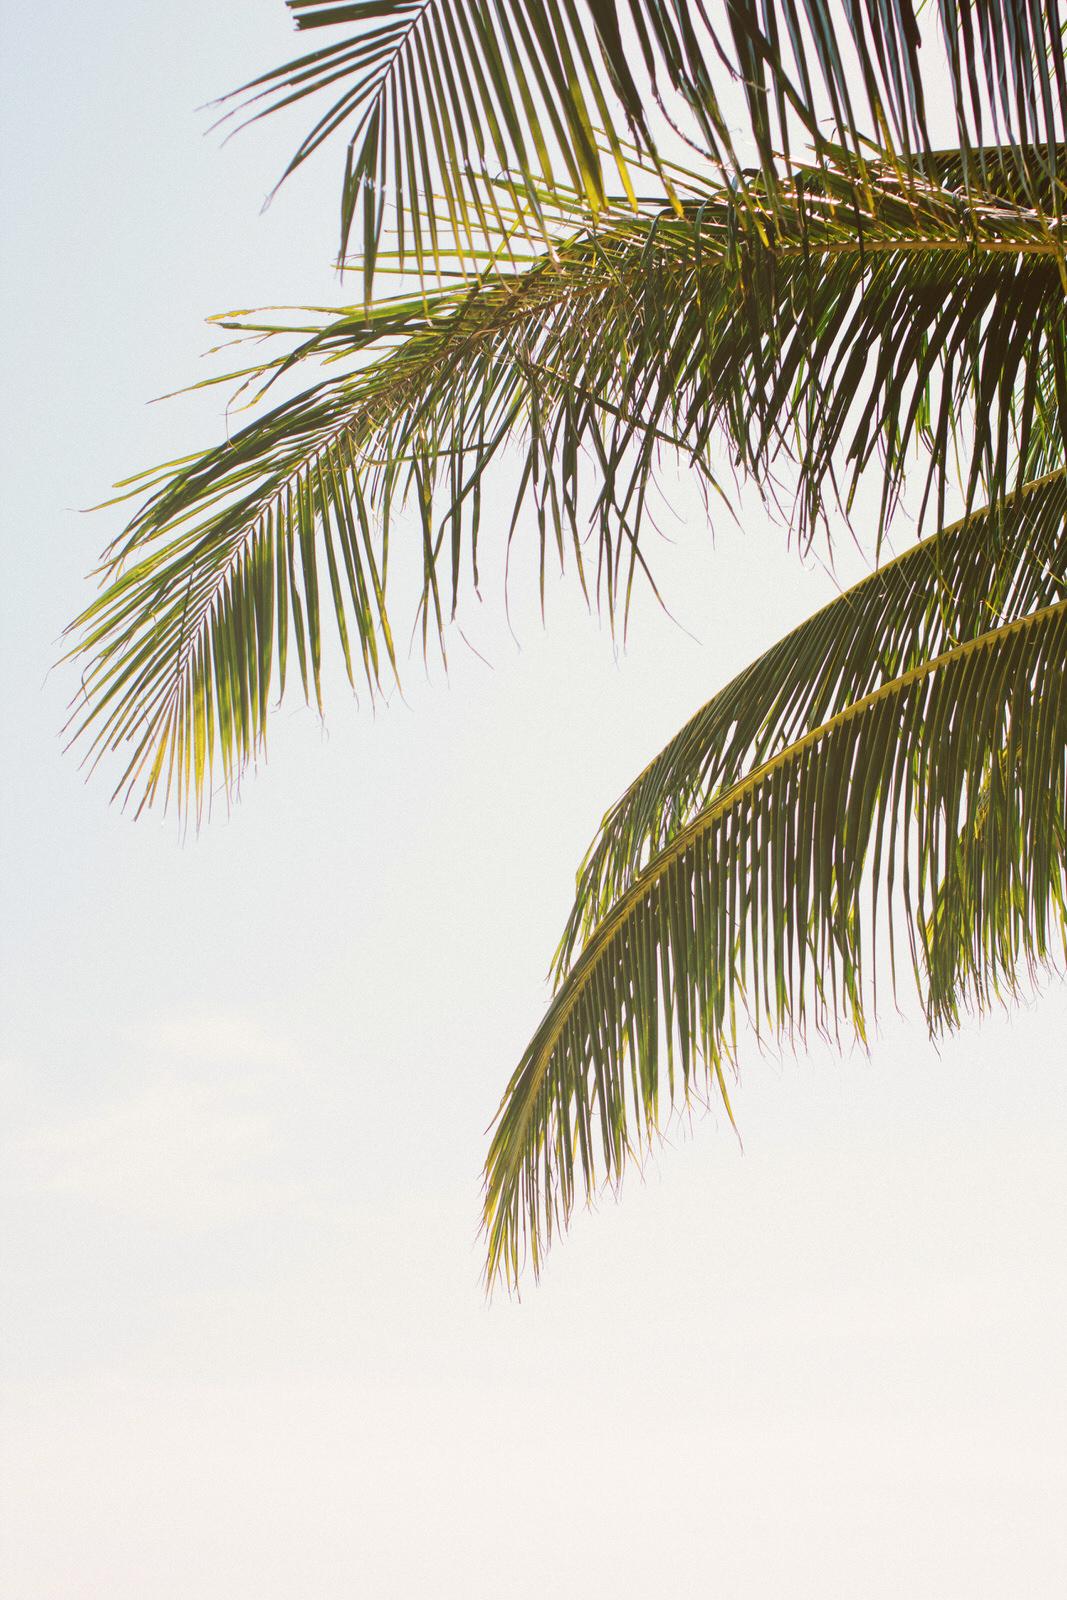 palm-tree-travel-lisa-pires.jpg